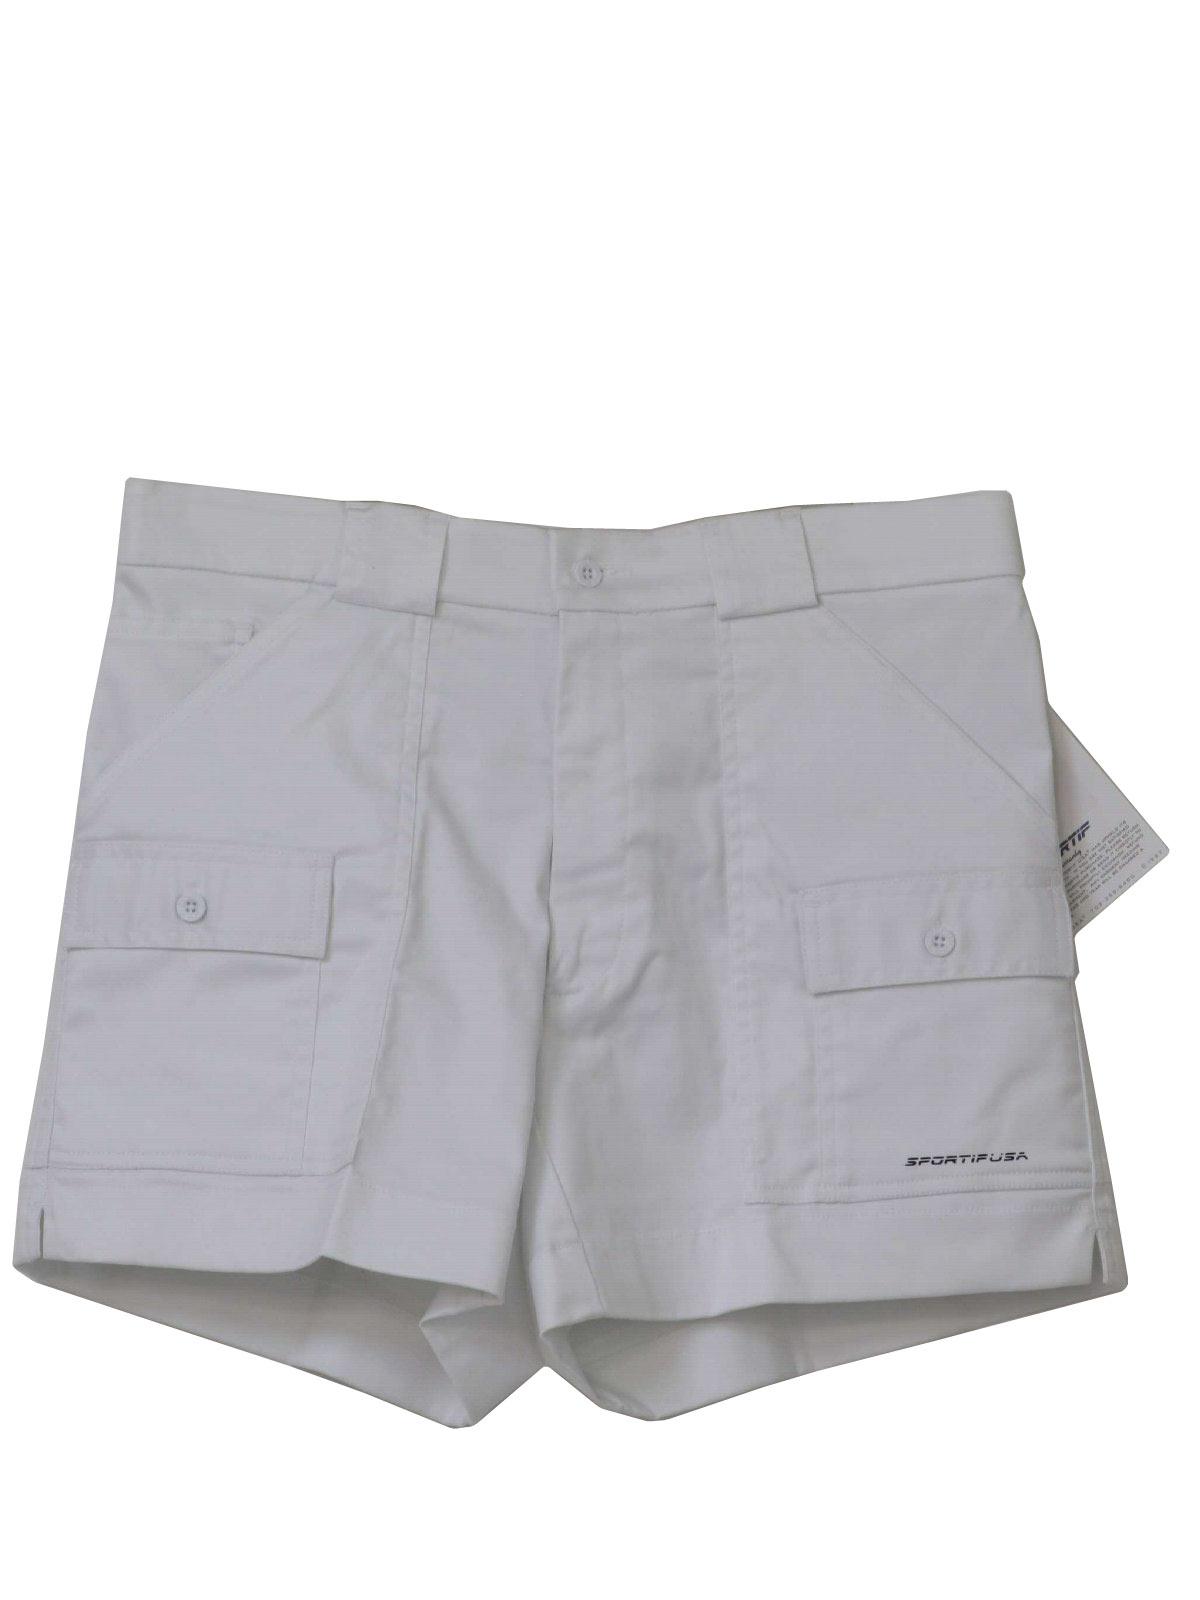 Shop - White Spandex Shorts